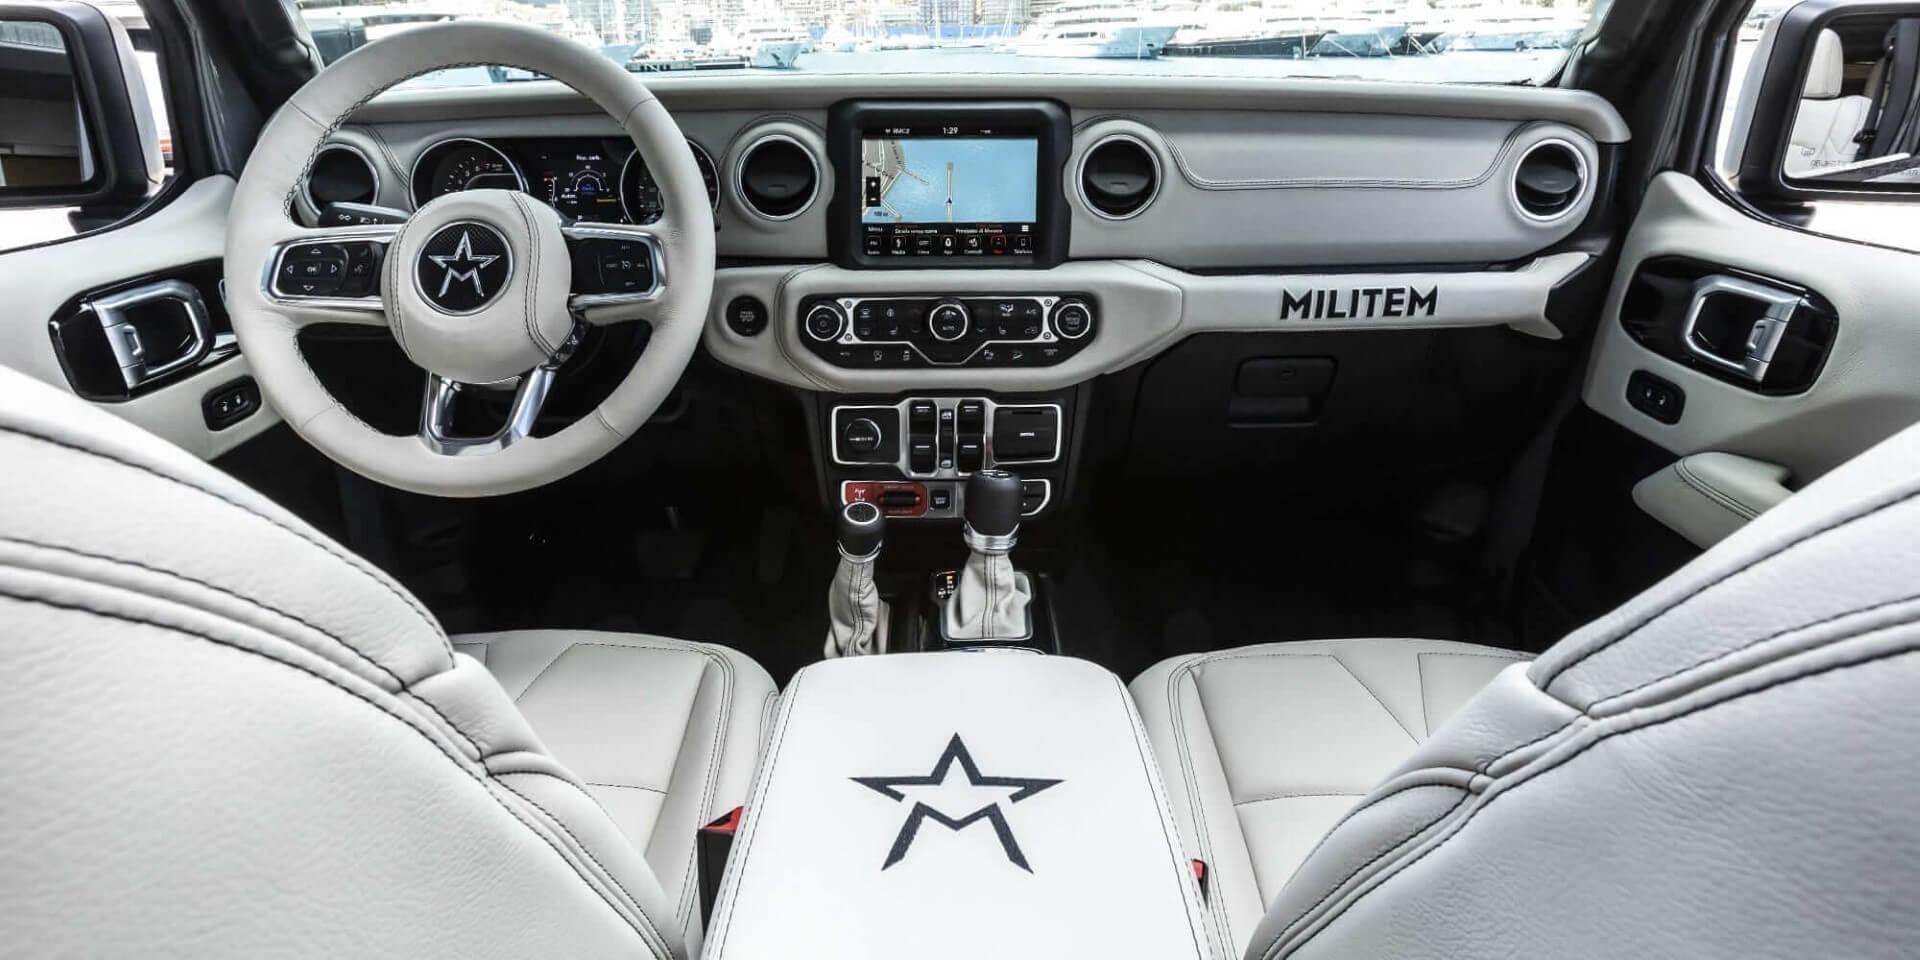 american 4×4 vehicle Ferox Militem interiors